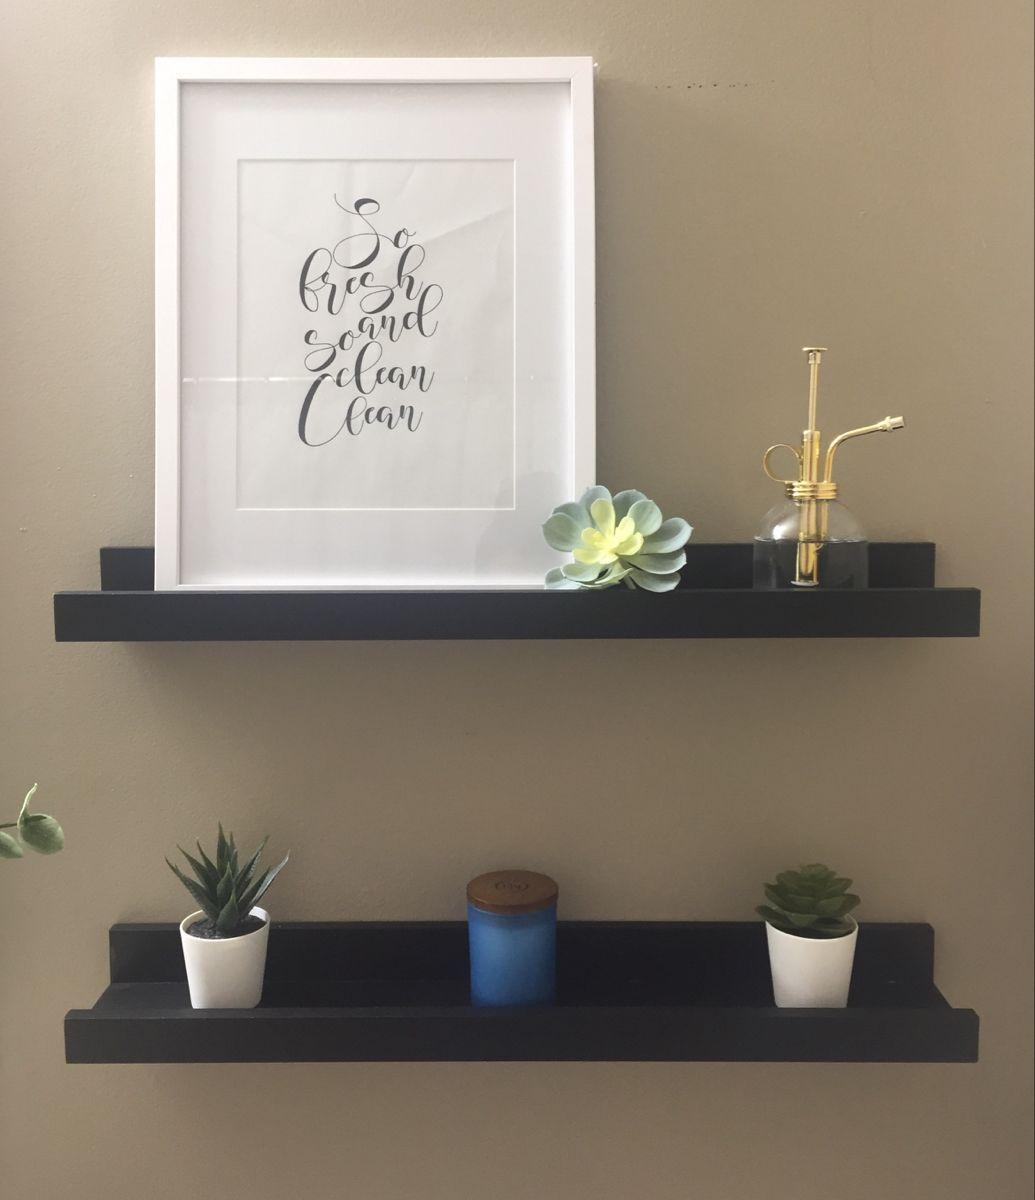 #bathroomdecor #bathroomideas #shelfdecorating #plants #homedecorideas #homesweethome #simplehomedecor